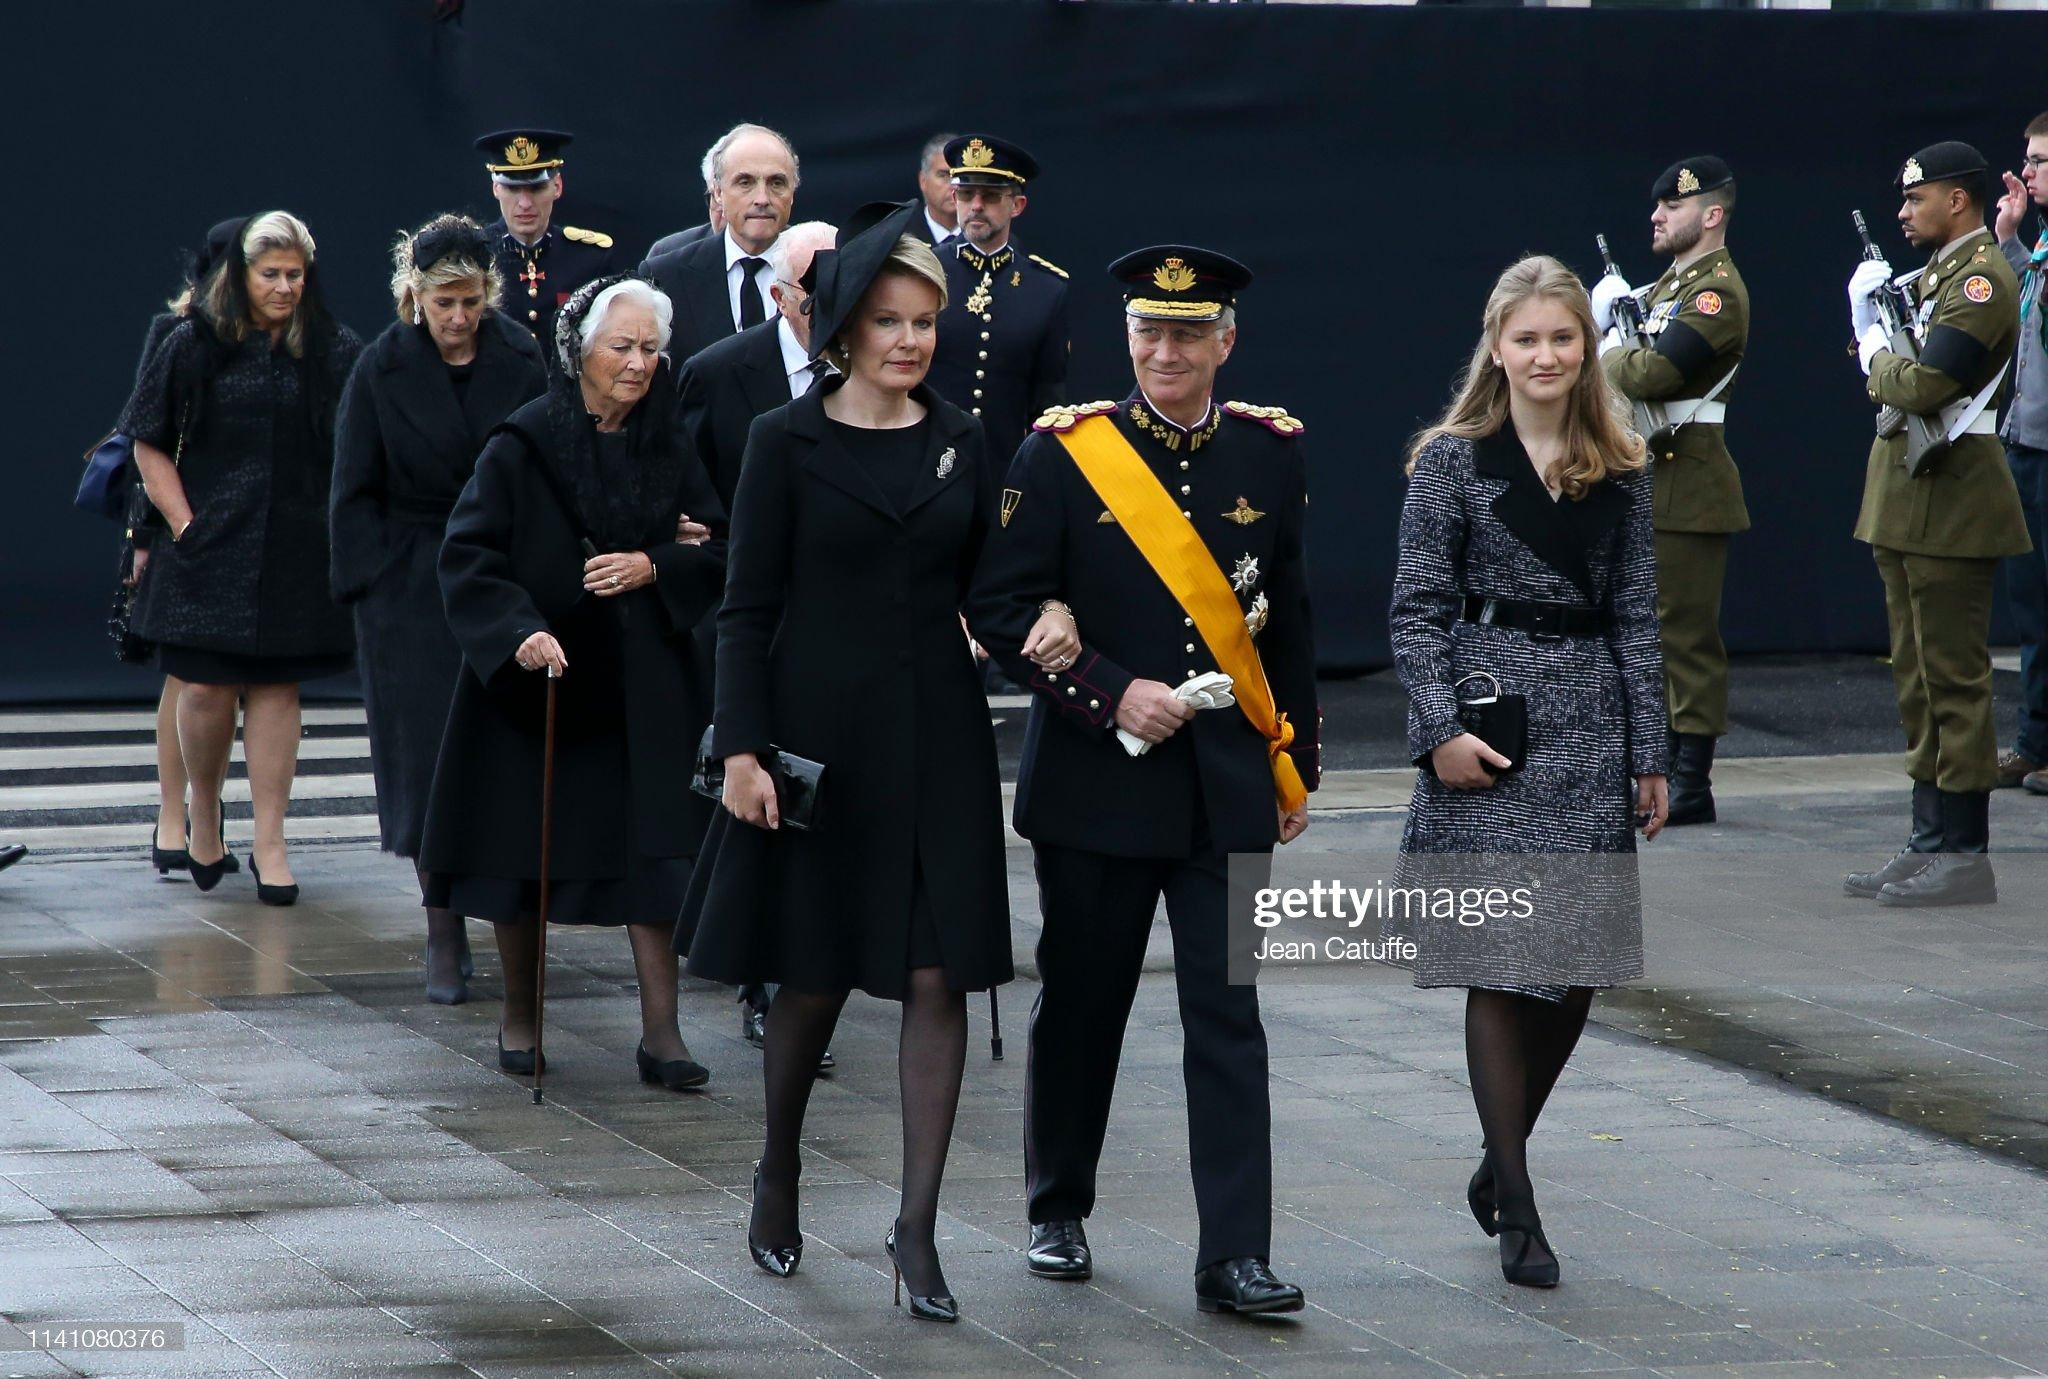 https://media.gettyimages.com/photos/king-philippe-of-belgium-queen-mathilde-of-belgium-princess-elisabeth-picture-id1141080376?s=2048x2048